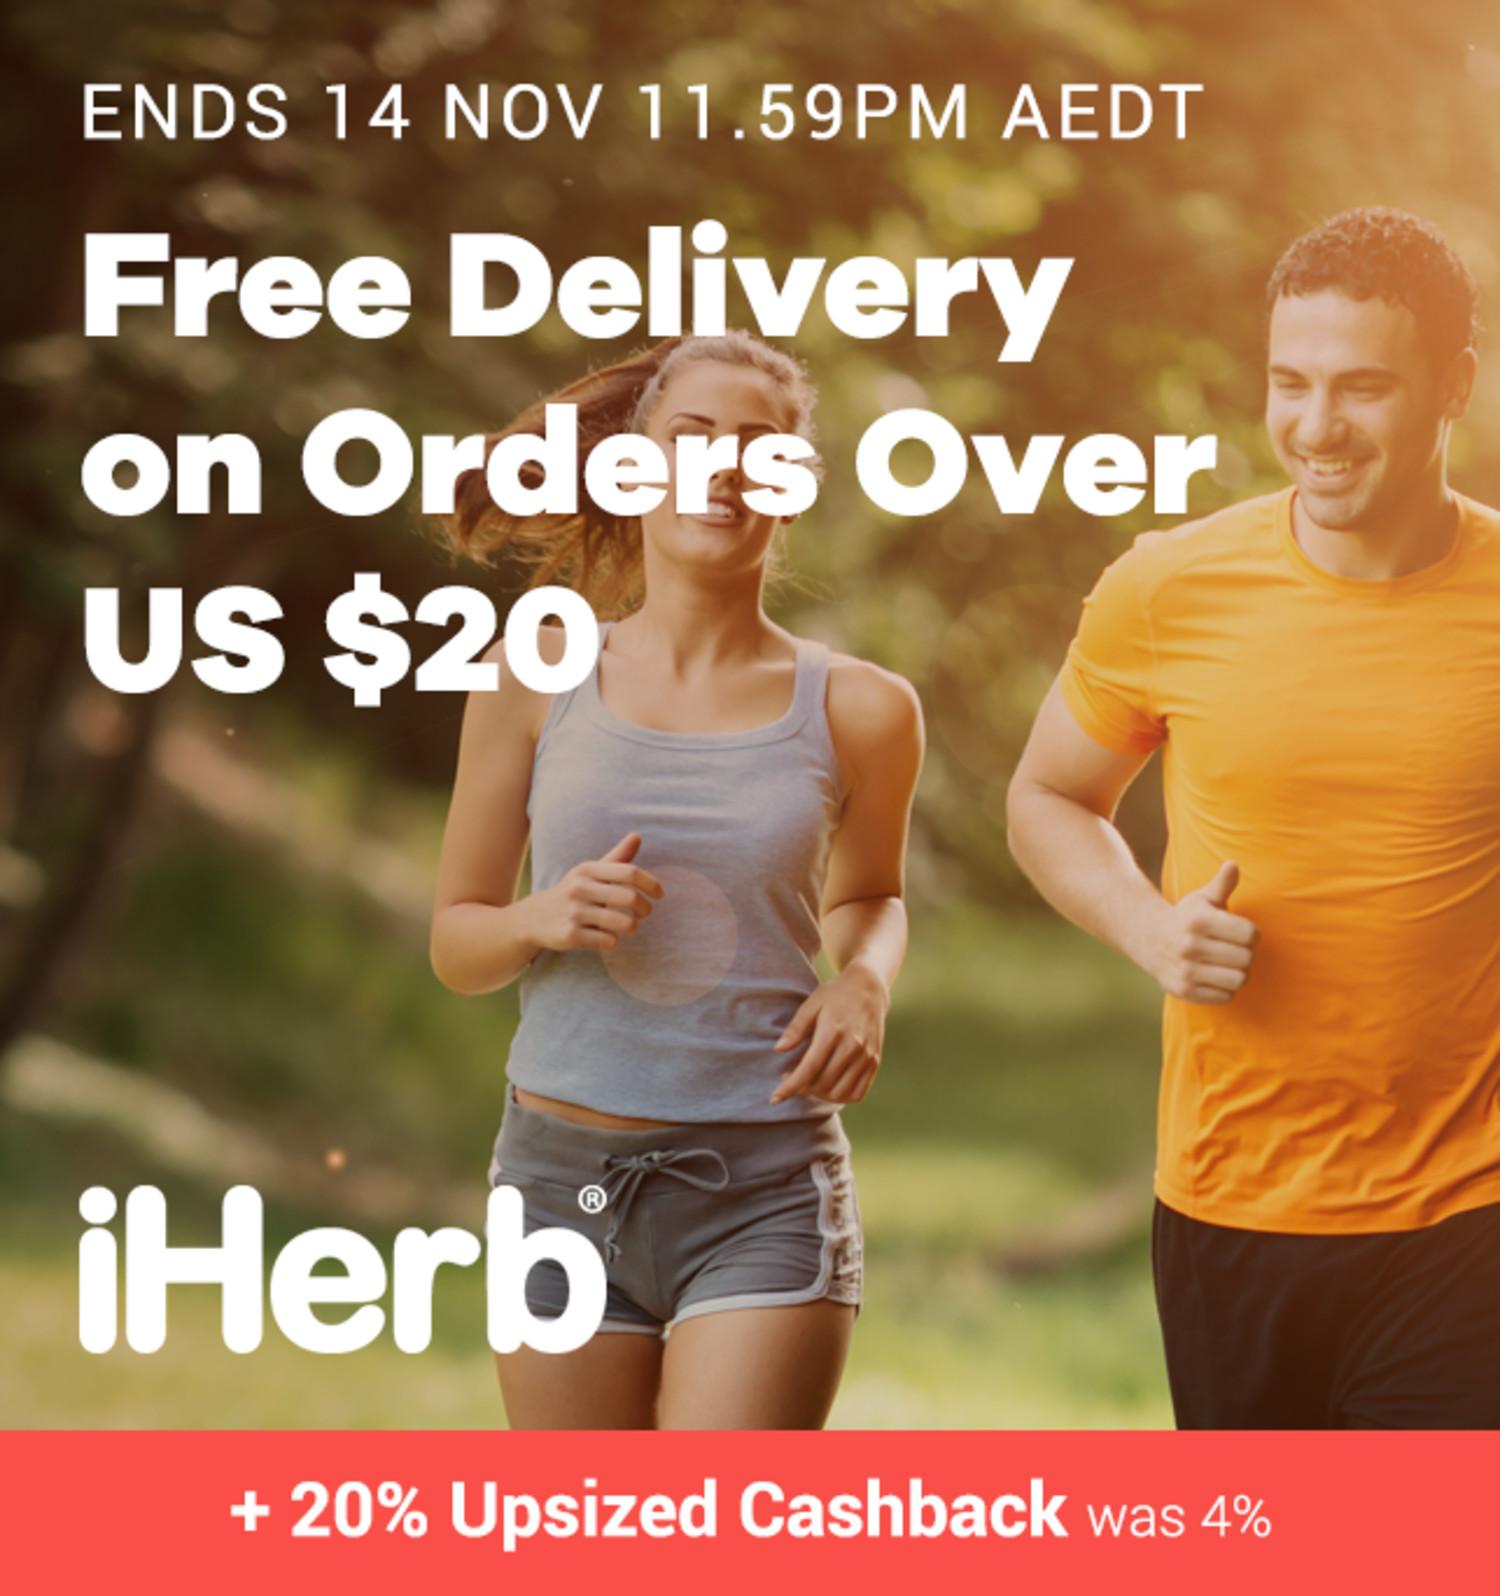 iHerb - 20% Upsized Cashback